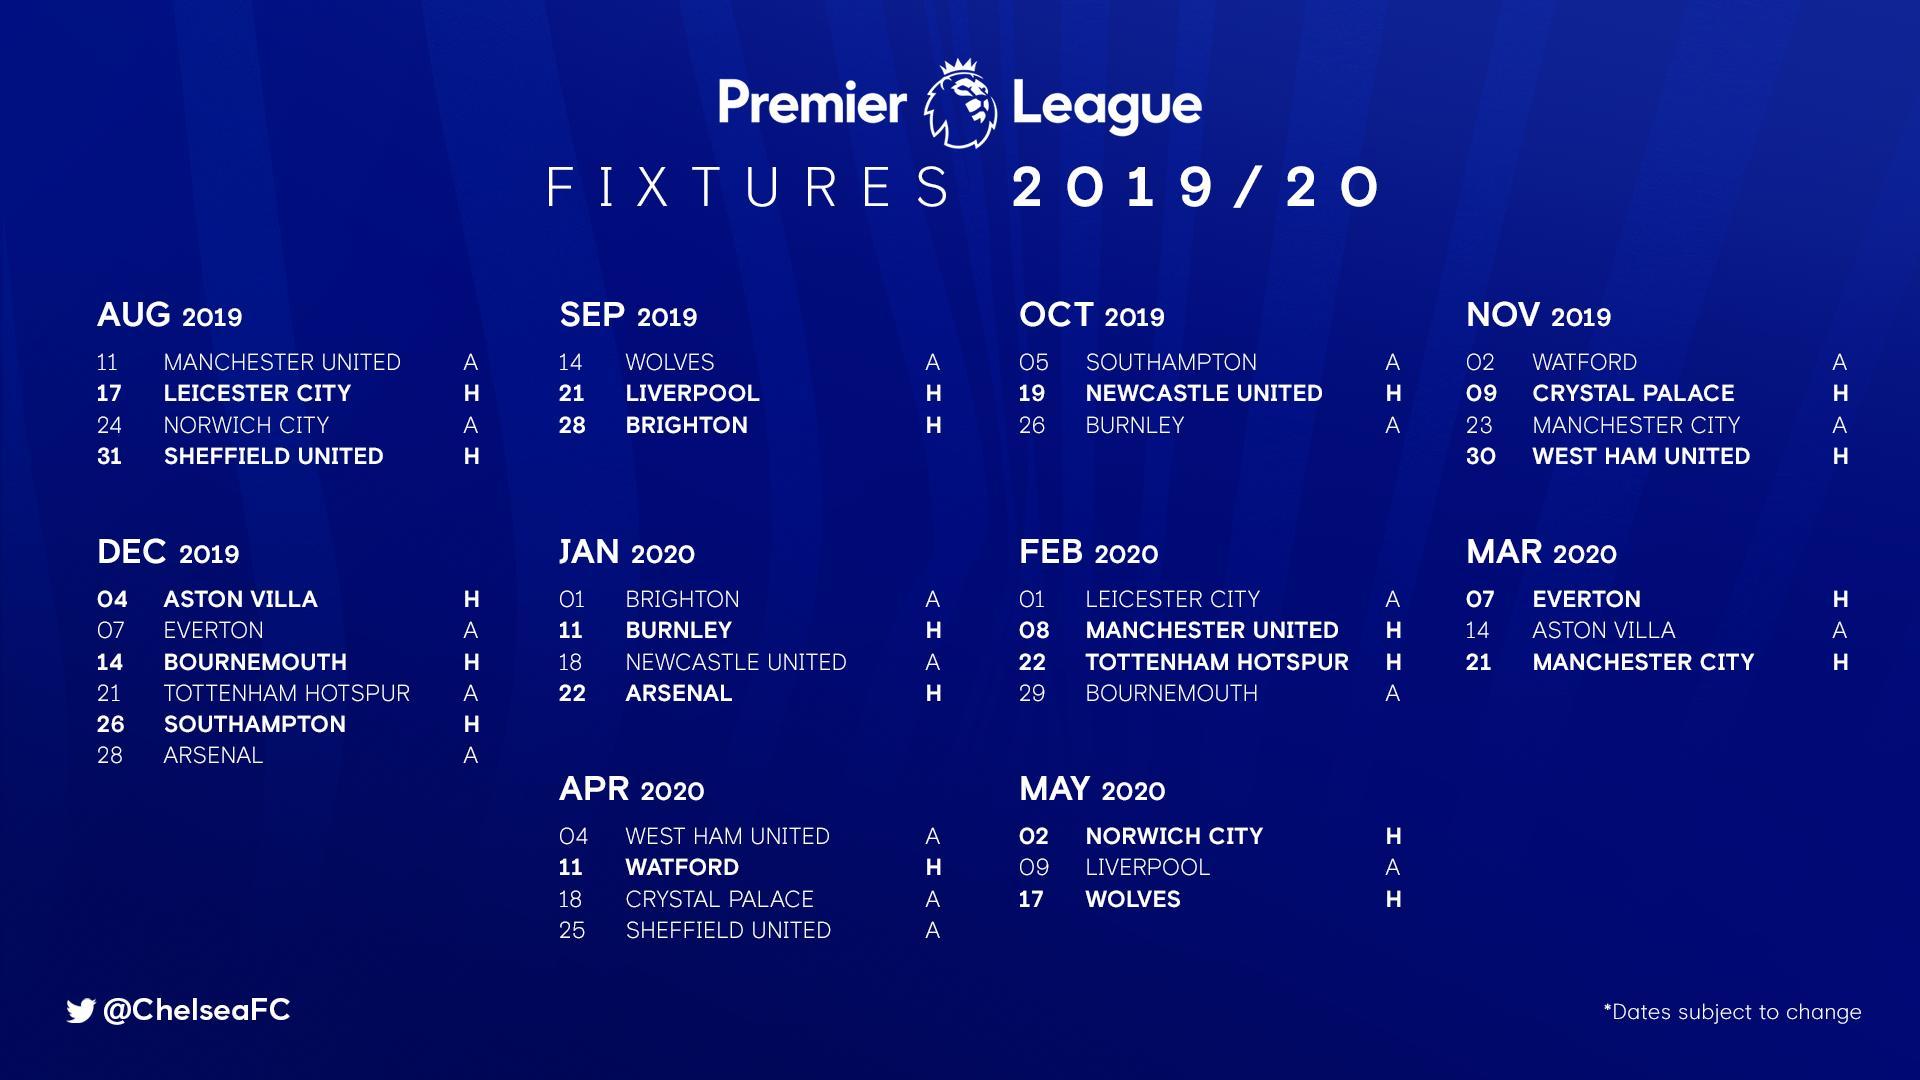 Chelsea Calendario.Calendario Jogos Premier League 19 20 Chelsea Chelsea Fans